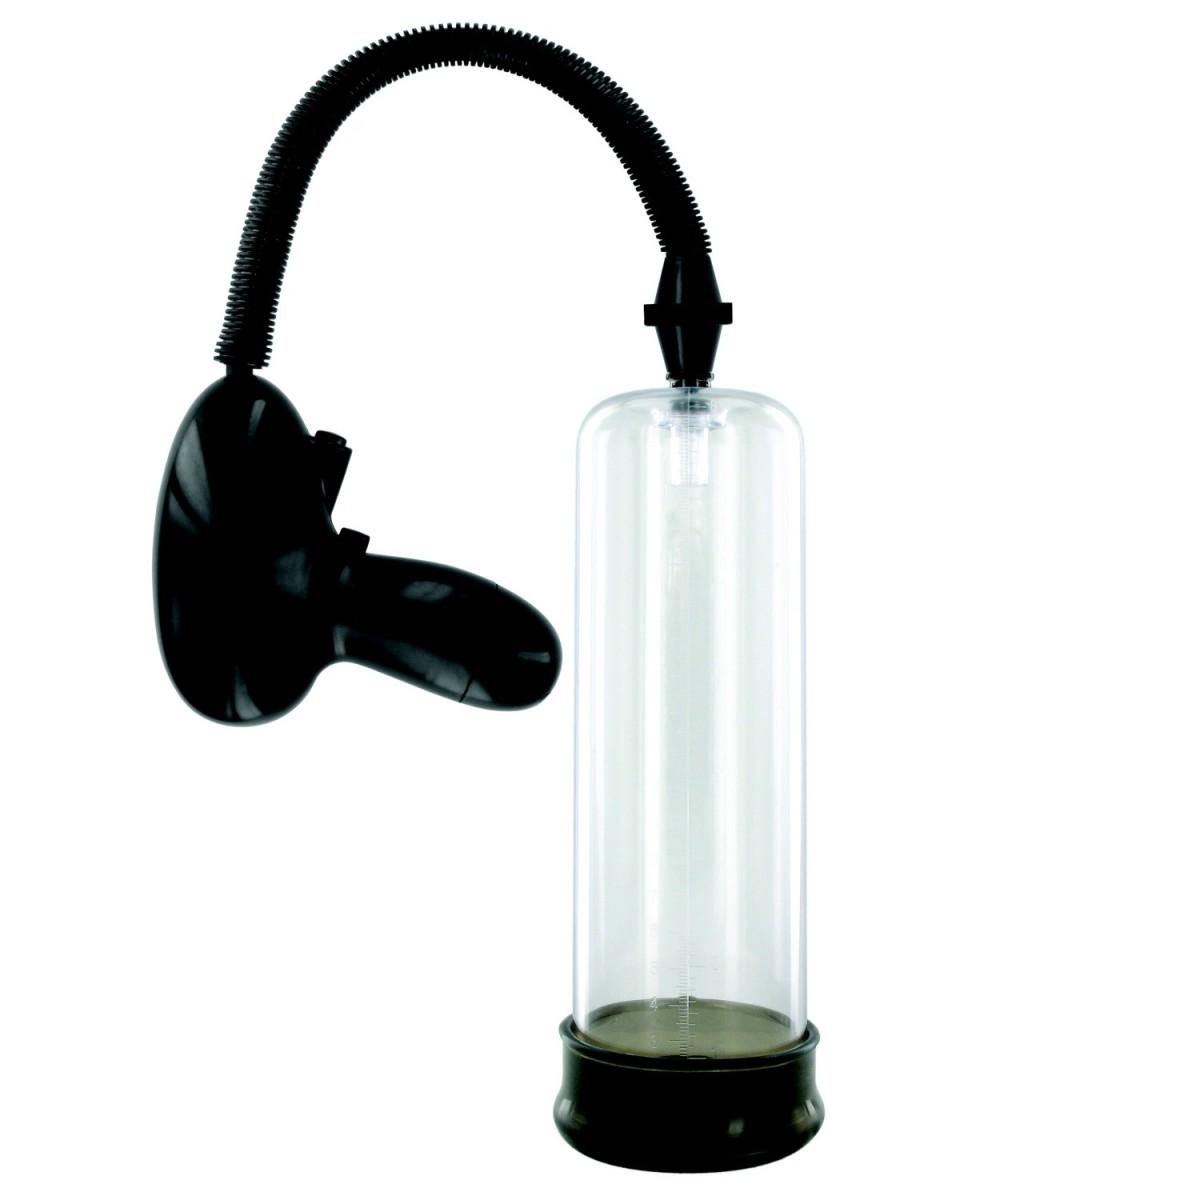 XLsucker Automatic Penis Pump